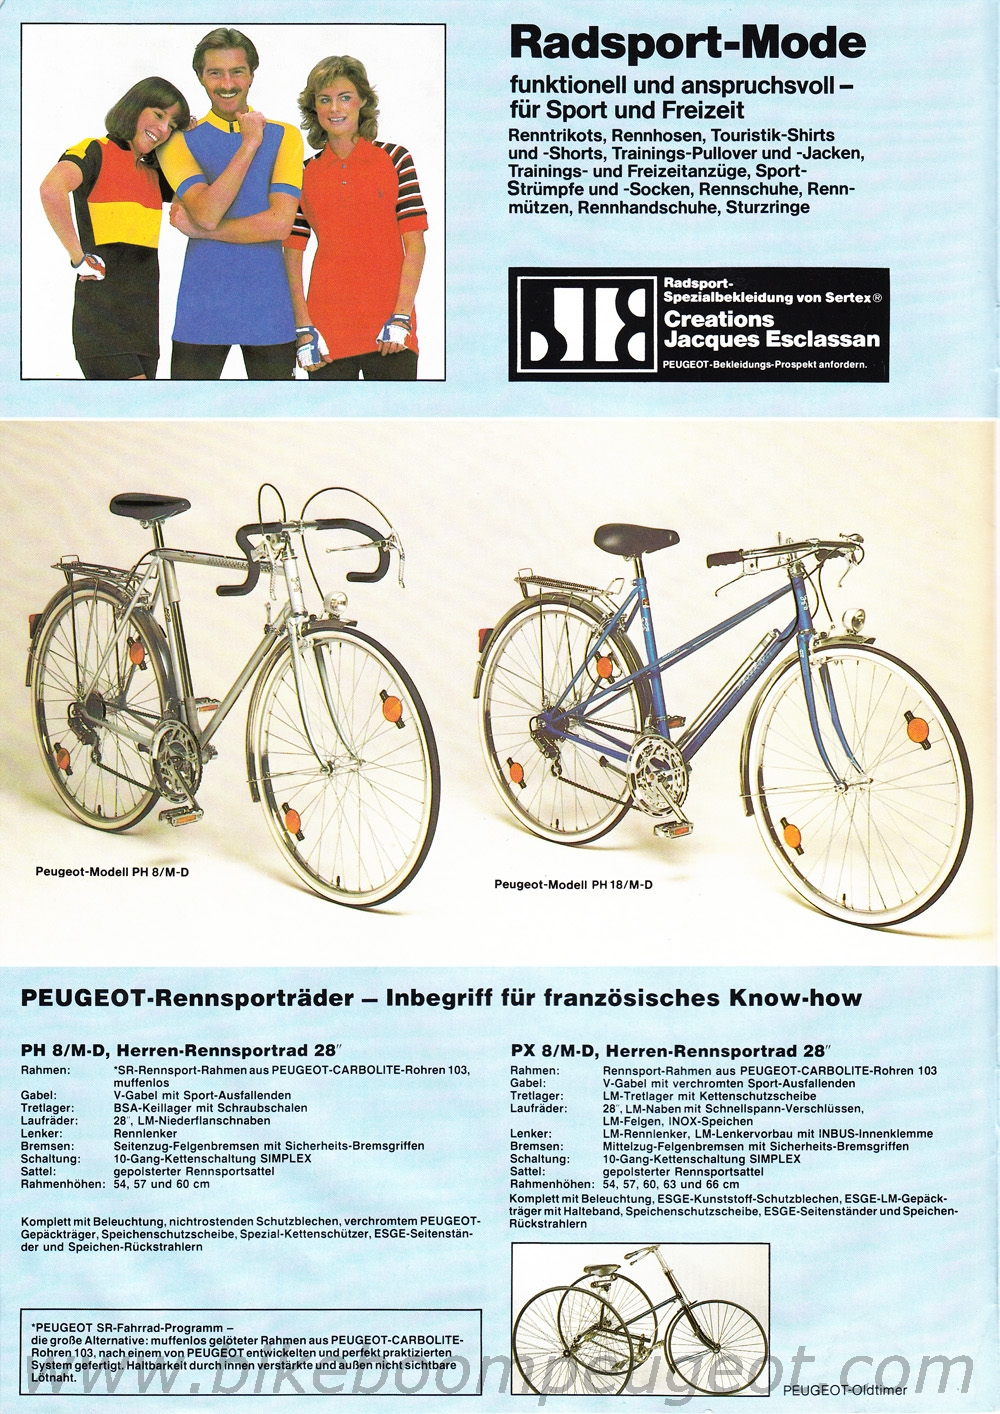 vorgefallene rahmenbrueche am fahrrad